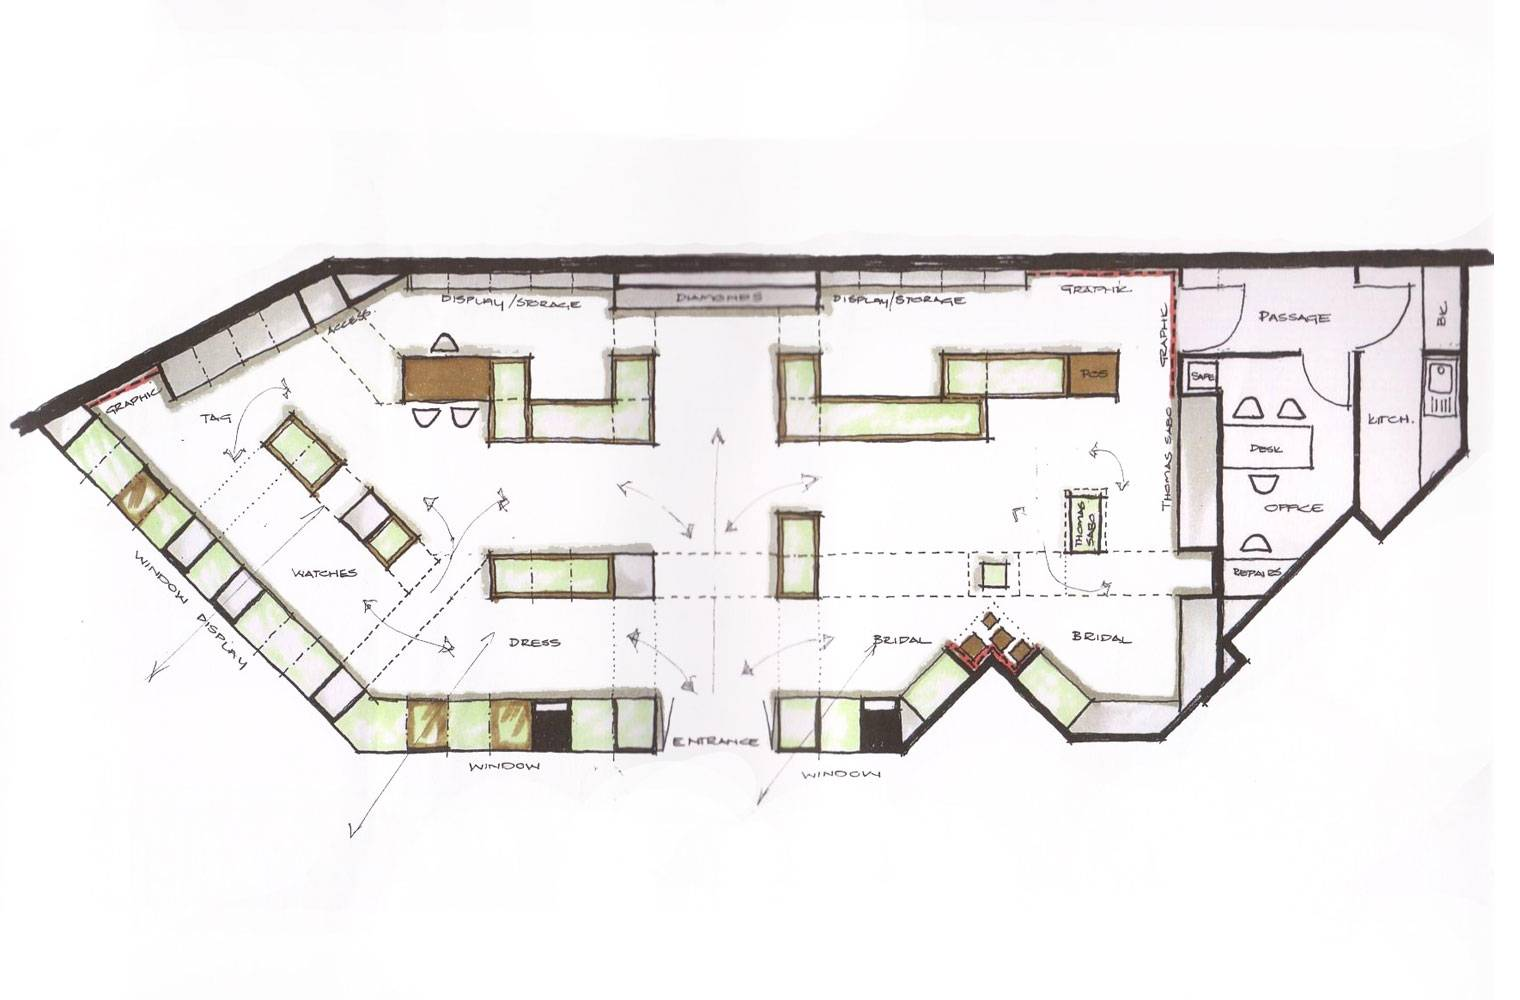 Tanur, Sandton City, Concept Plan